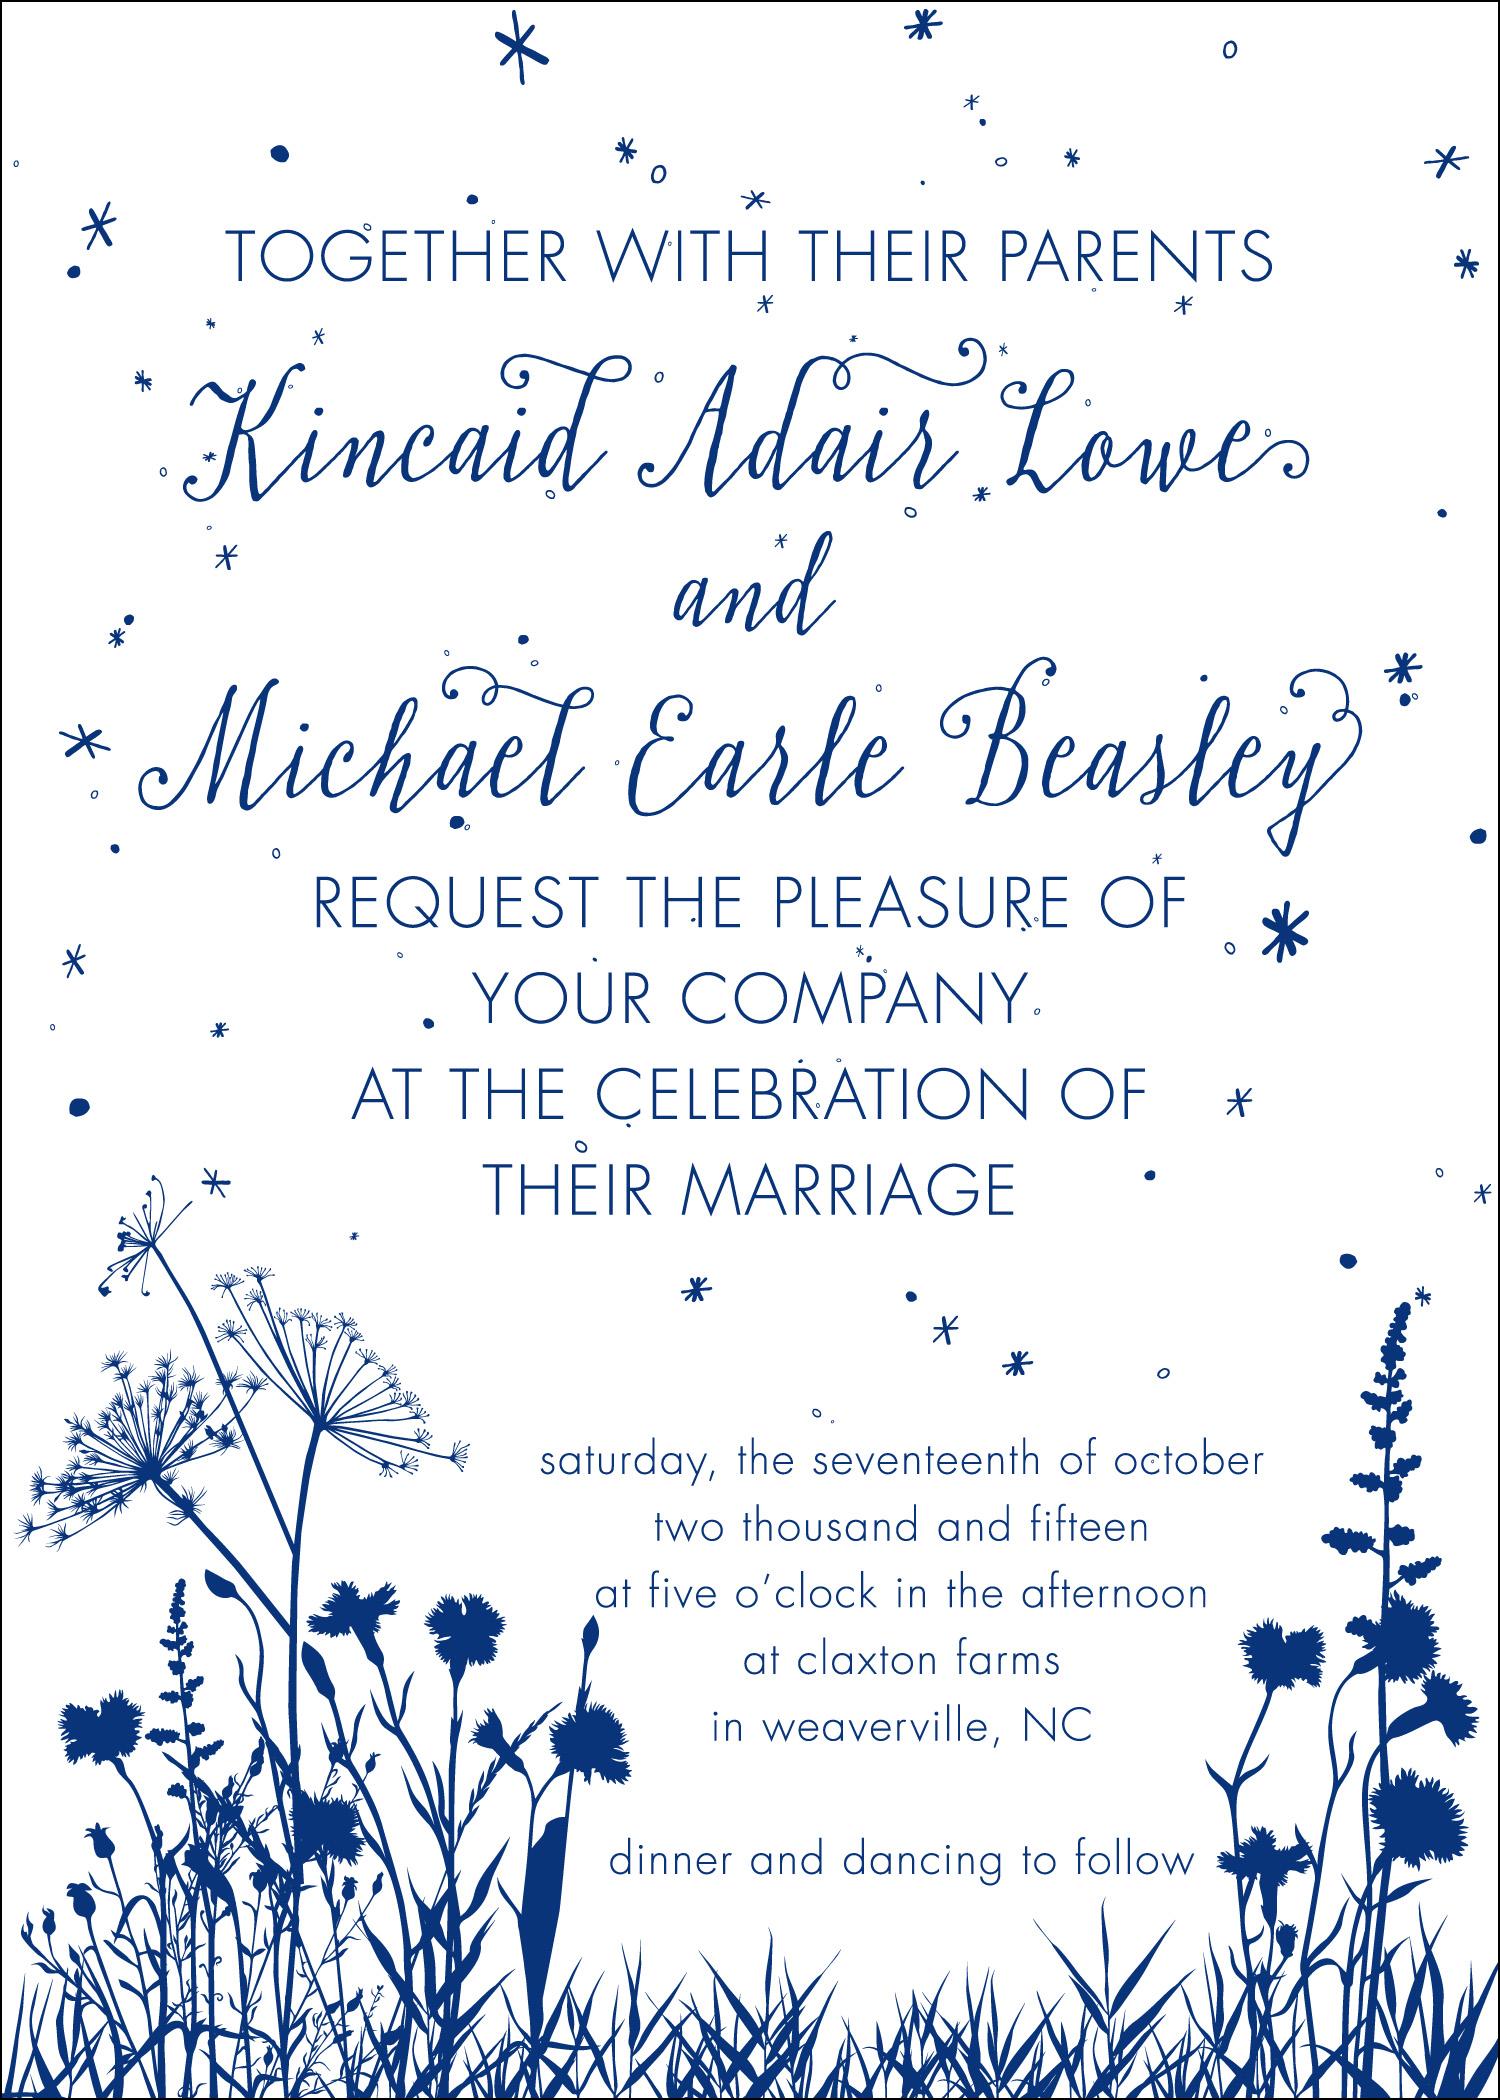 Lowe-Beasley Wedding, Invitation